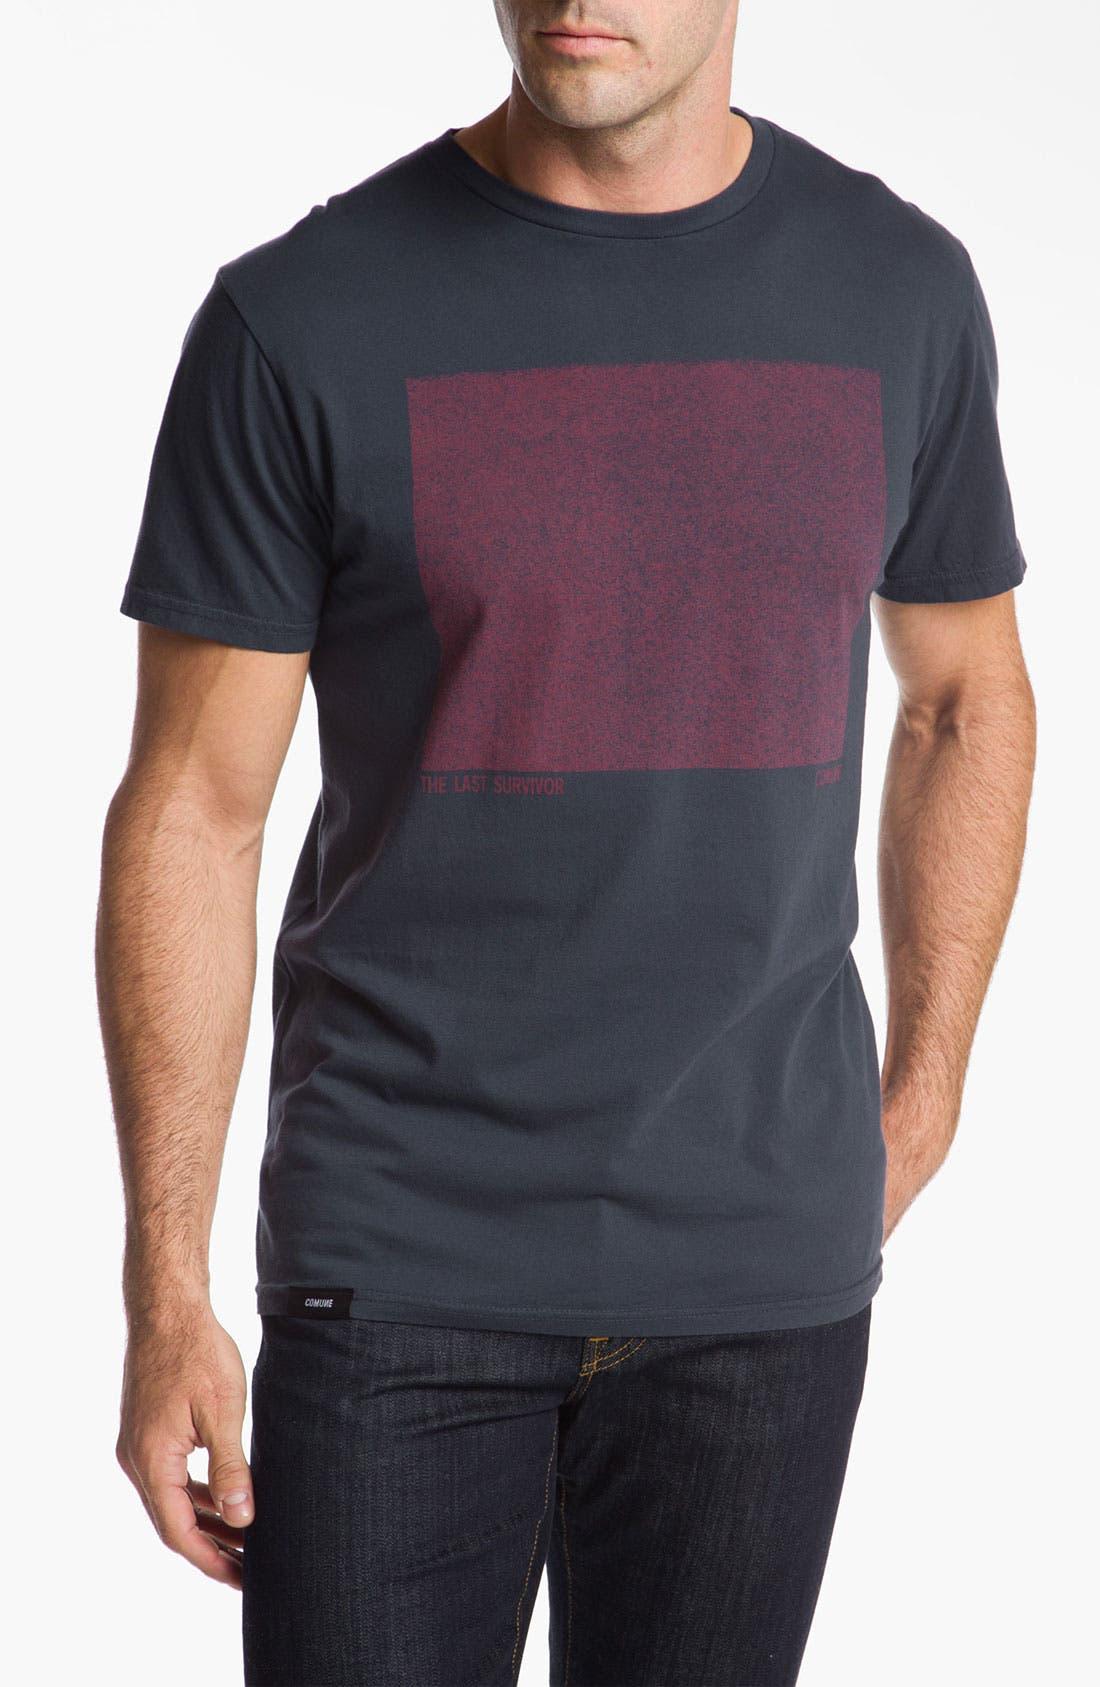 Alternate Image 1 Selected - Comune 'Last Survivor' Graphic T-Shirt